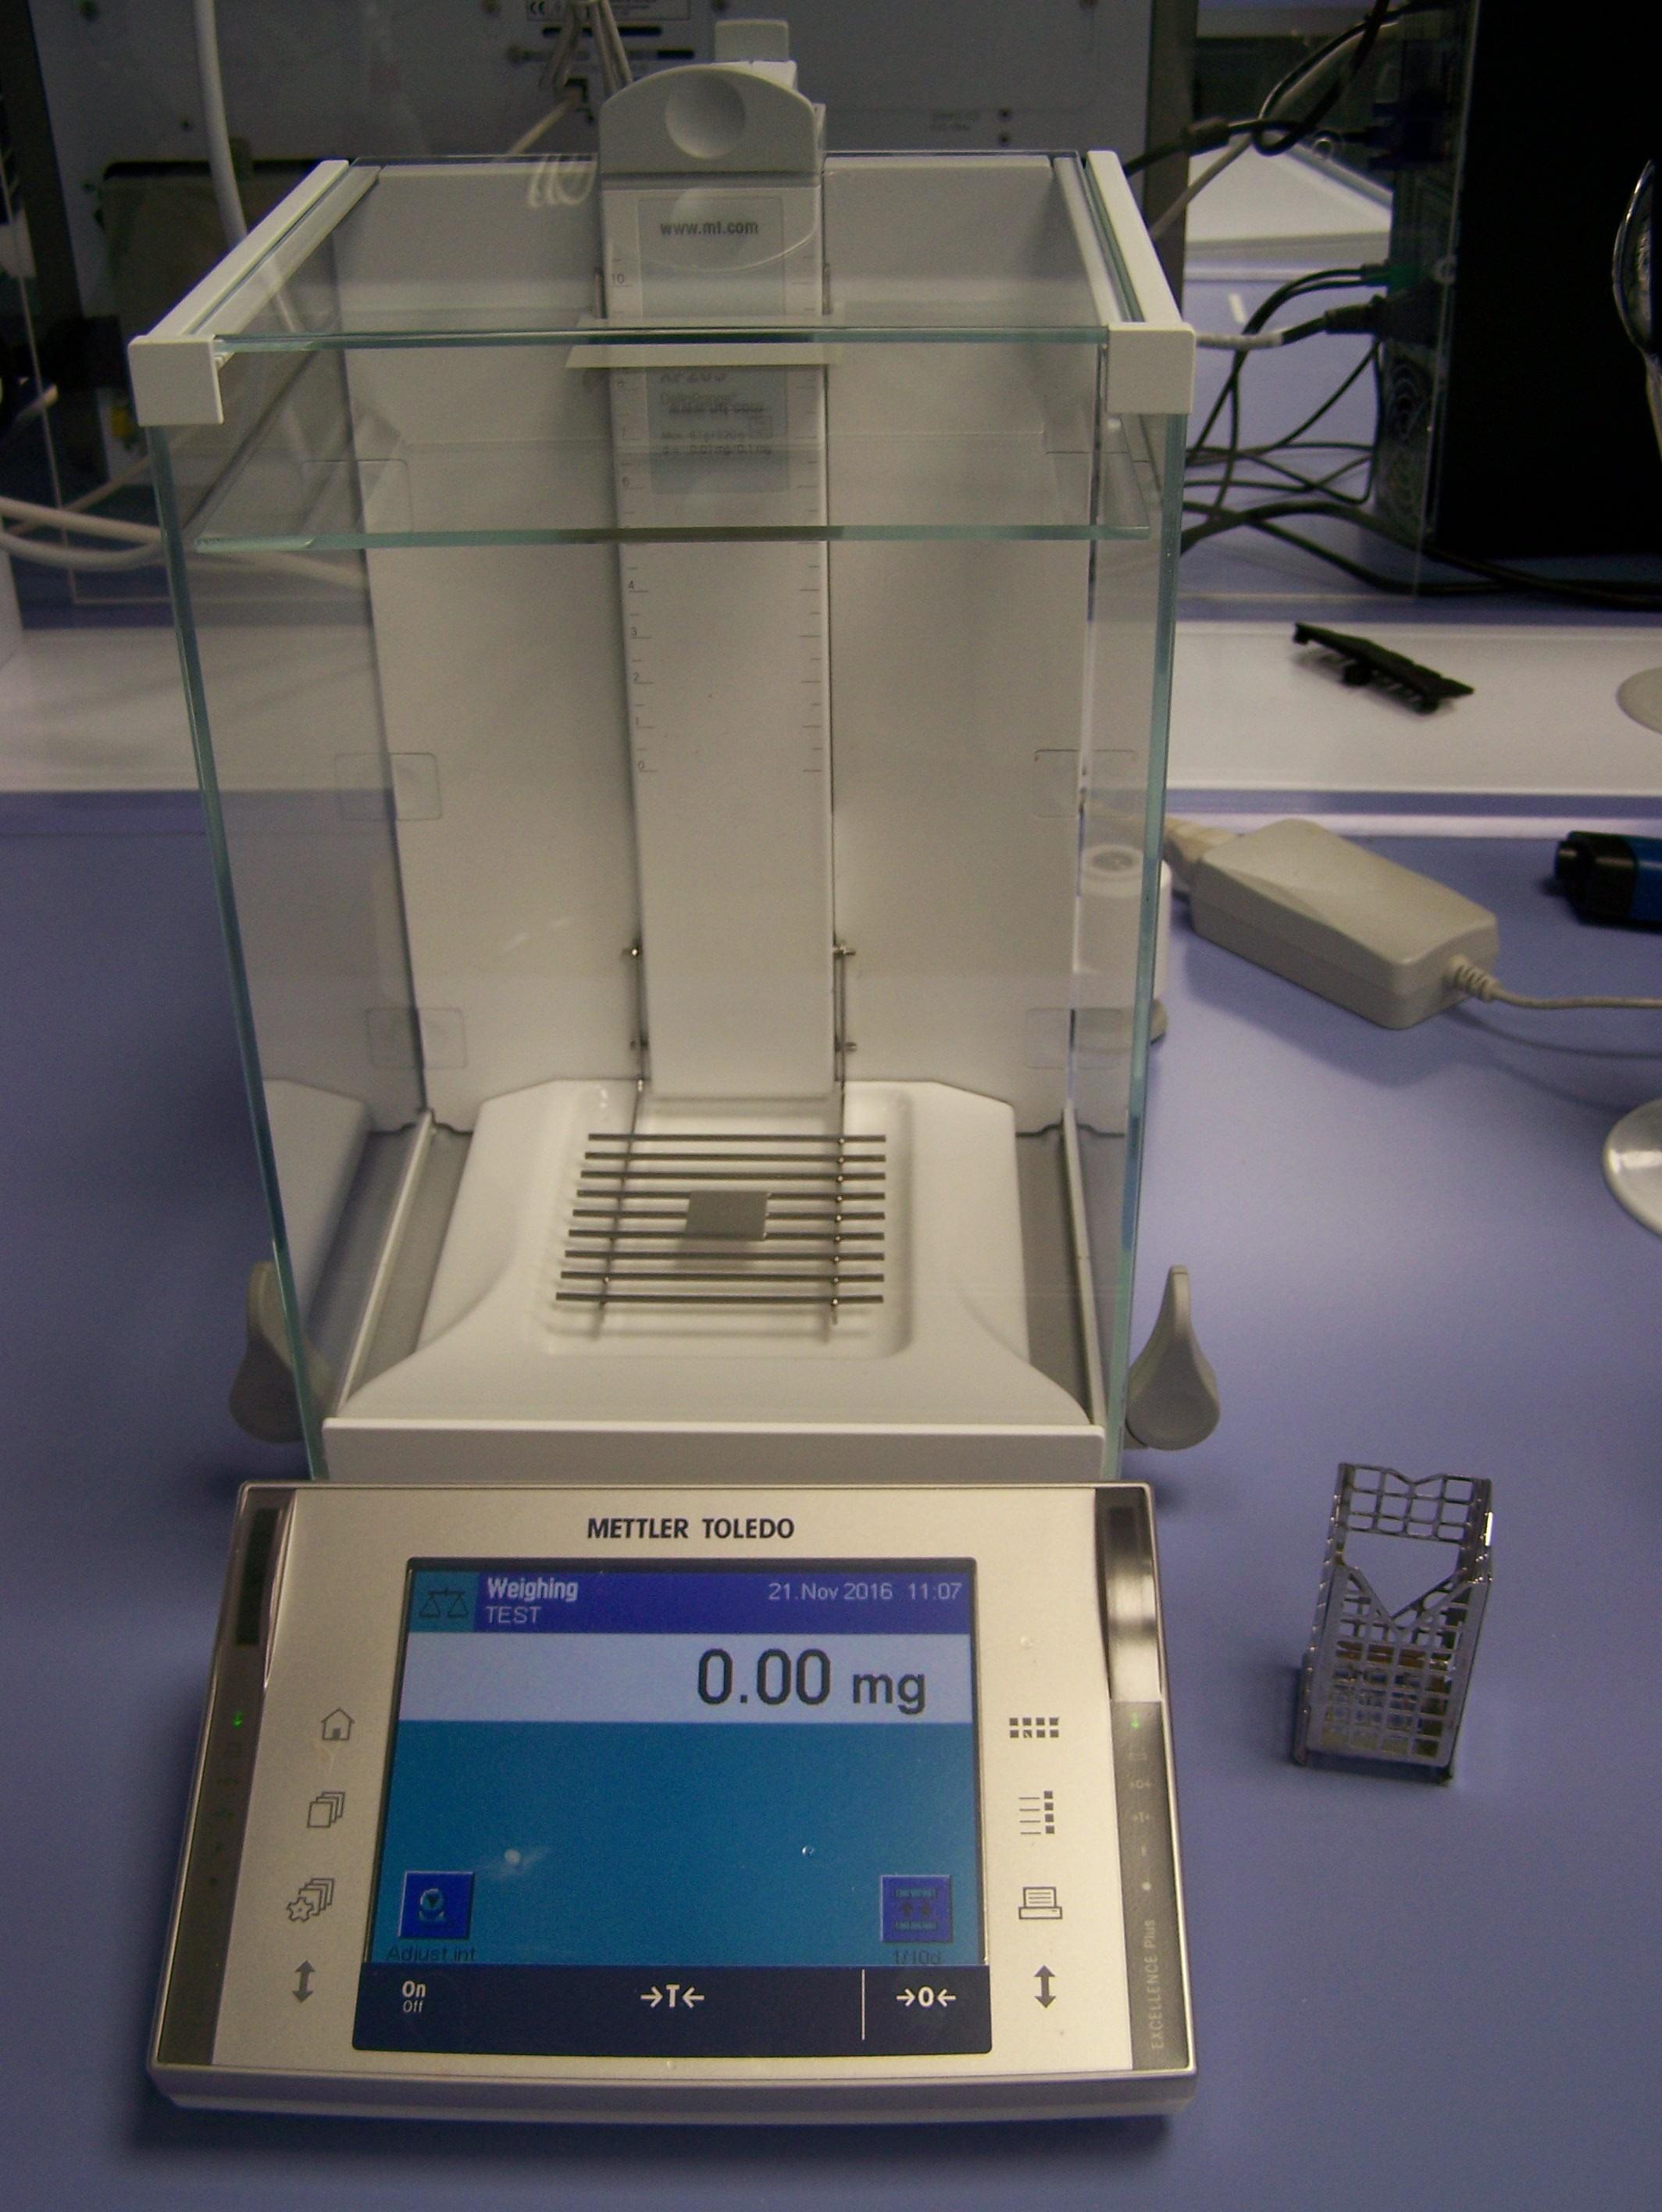 lab-cards/utilization-of-balances/img/Ergo-Clip.jpg